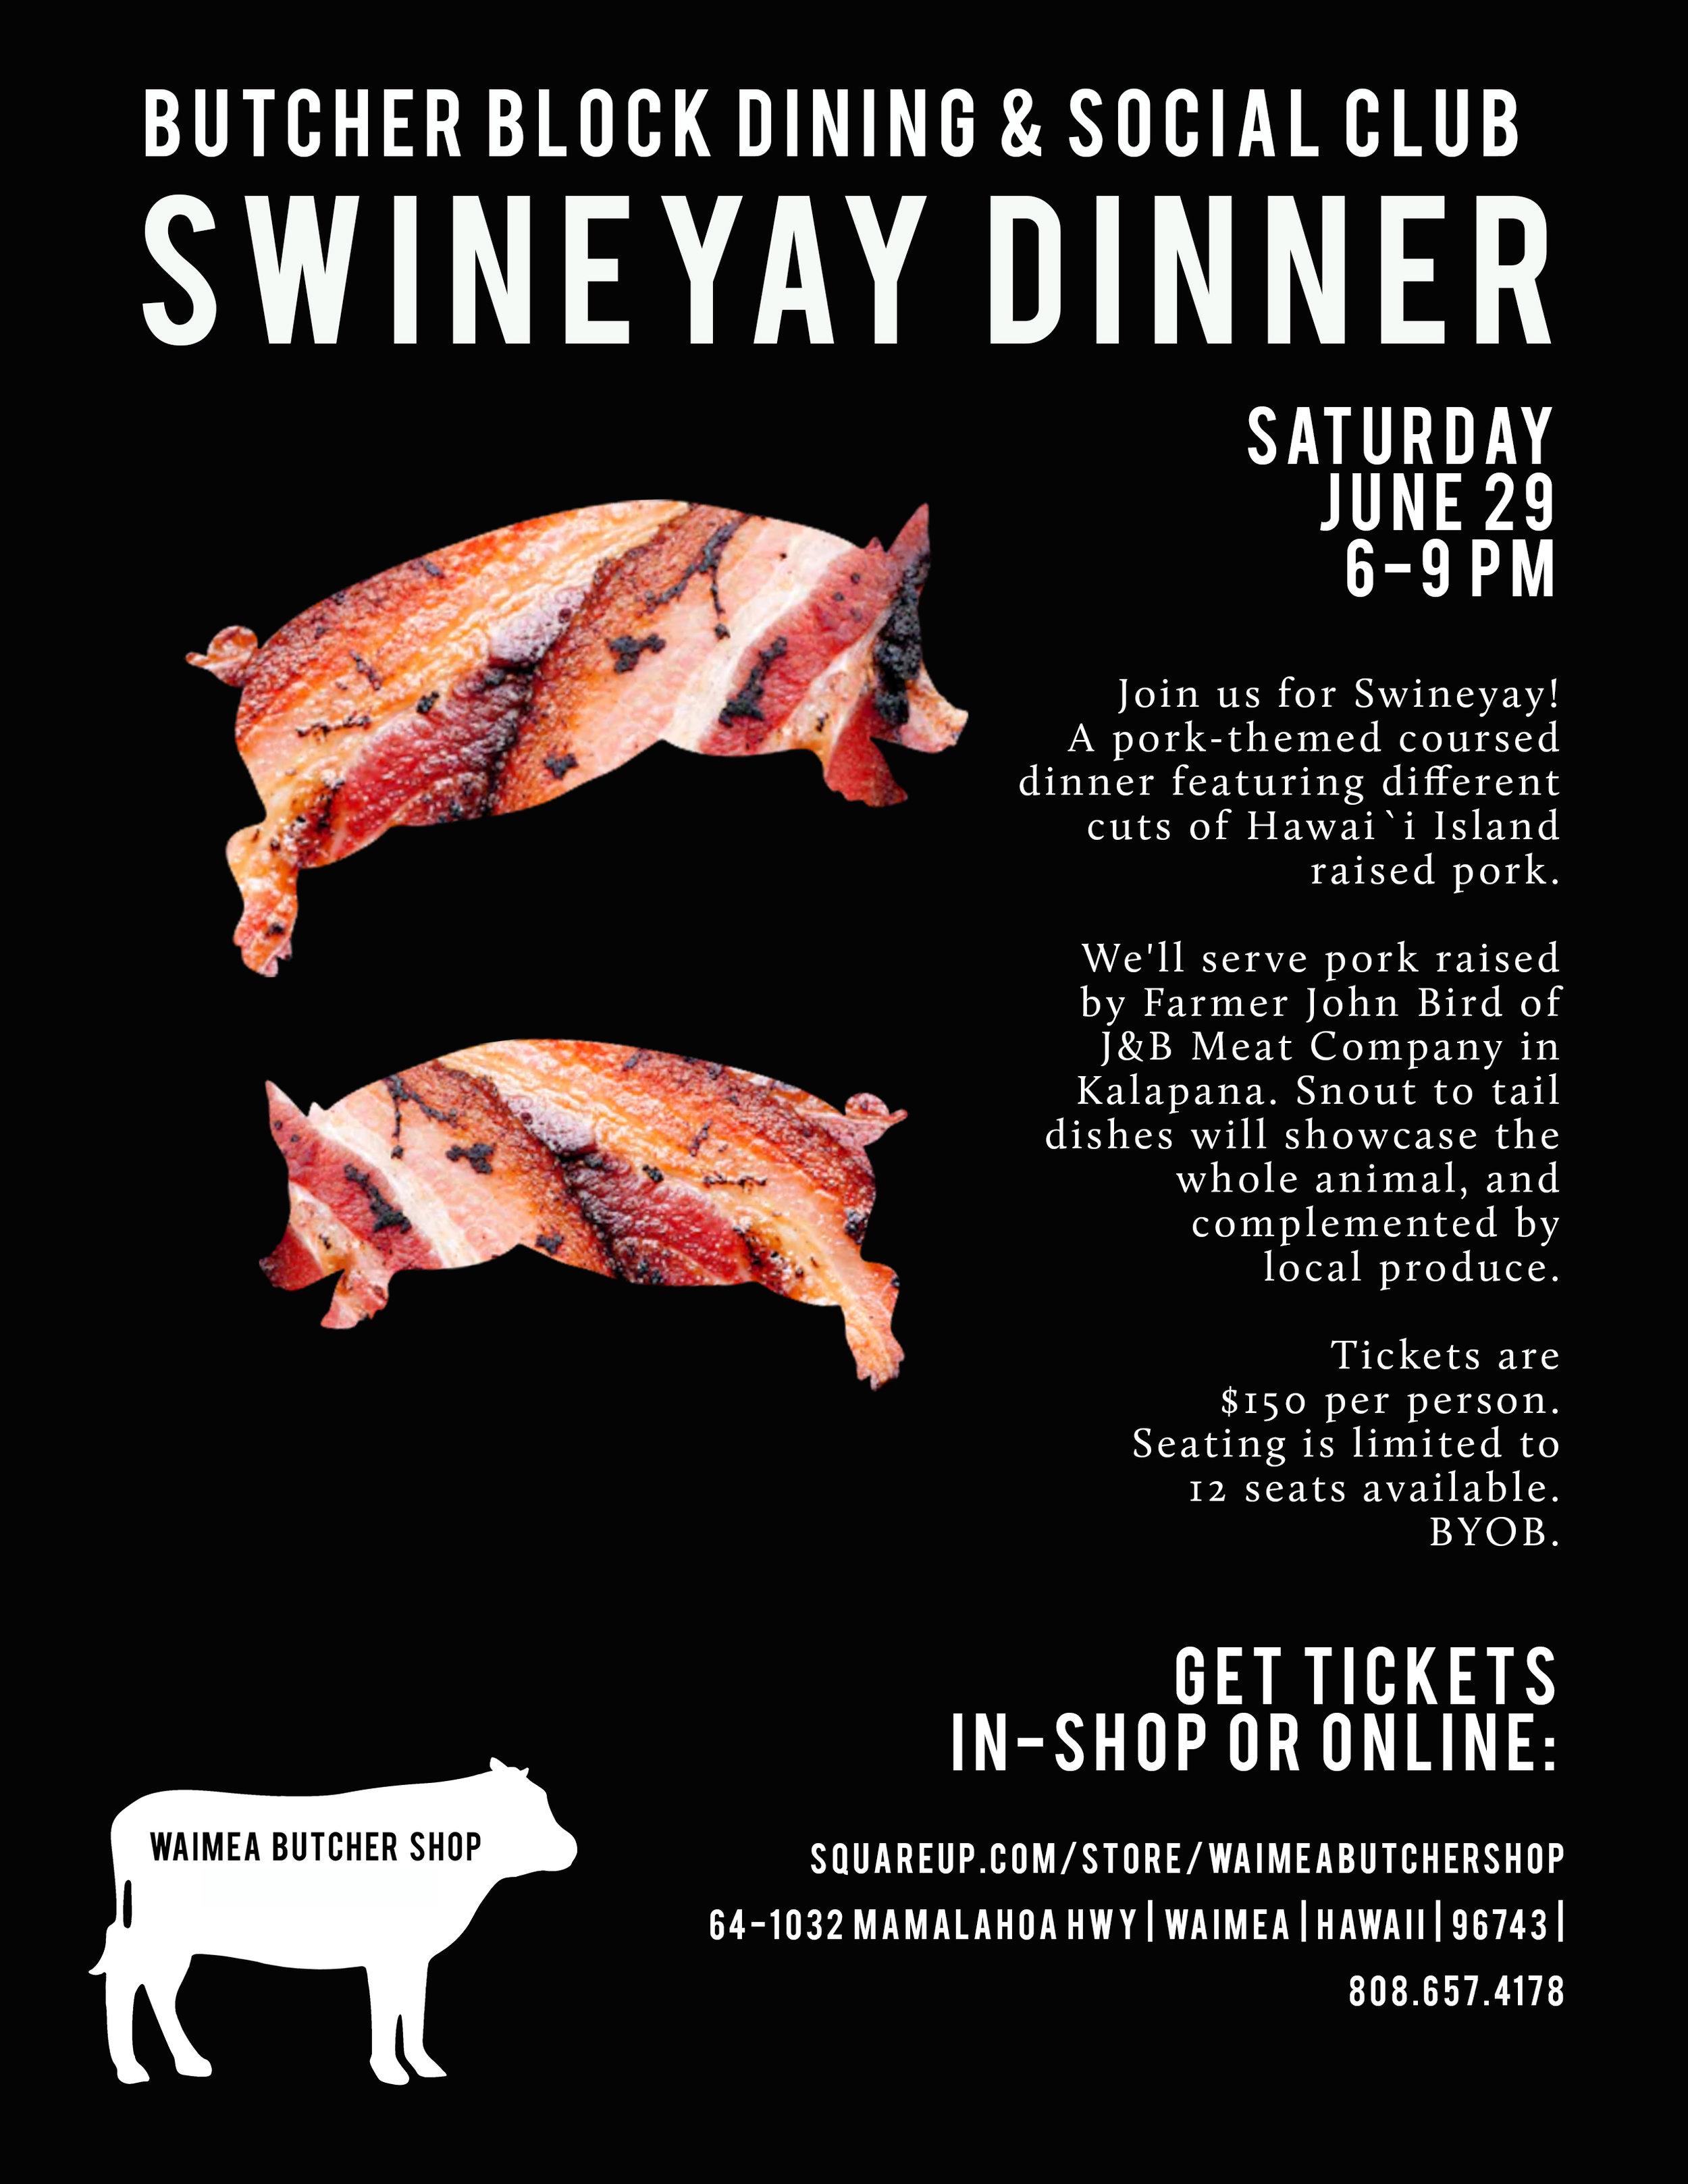 Web_June 2019 Dinner_Swineyay.jpg